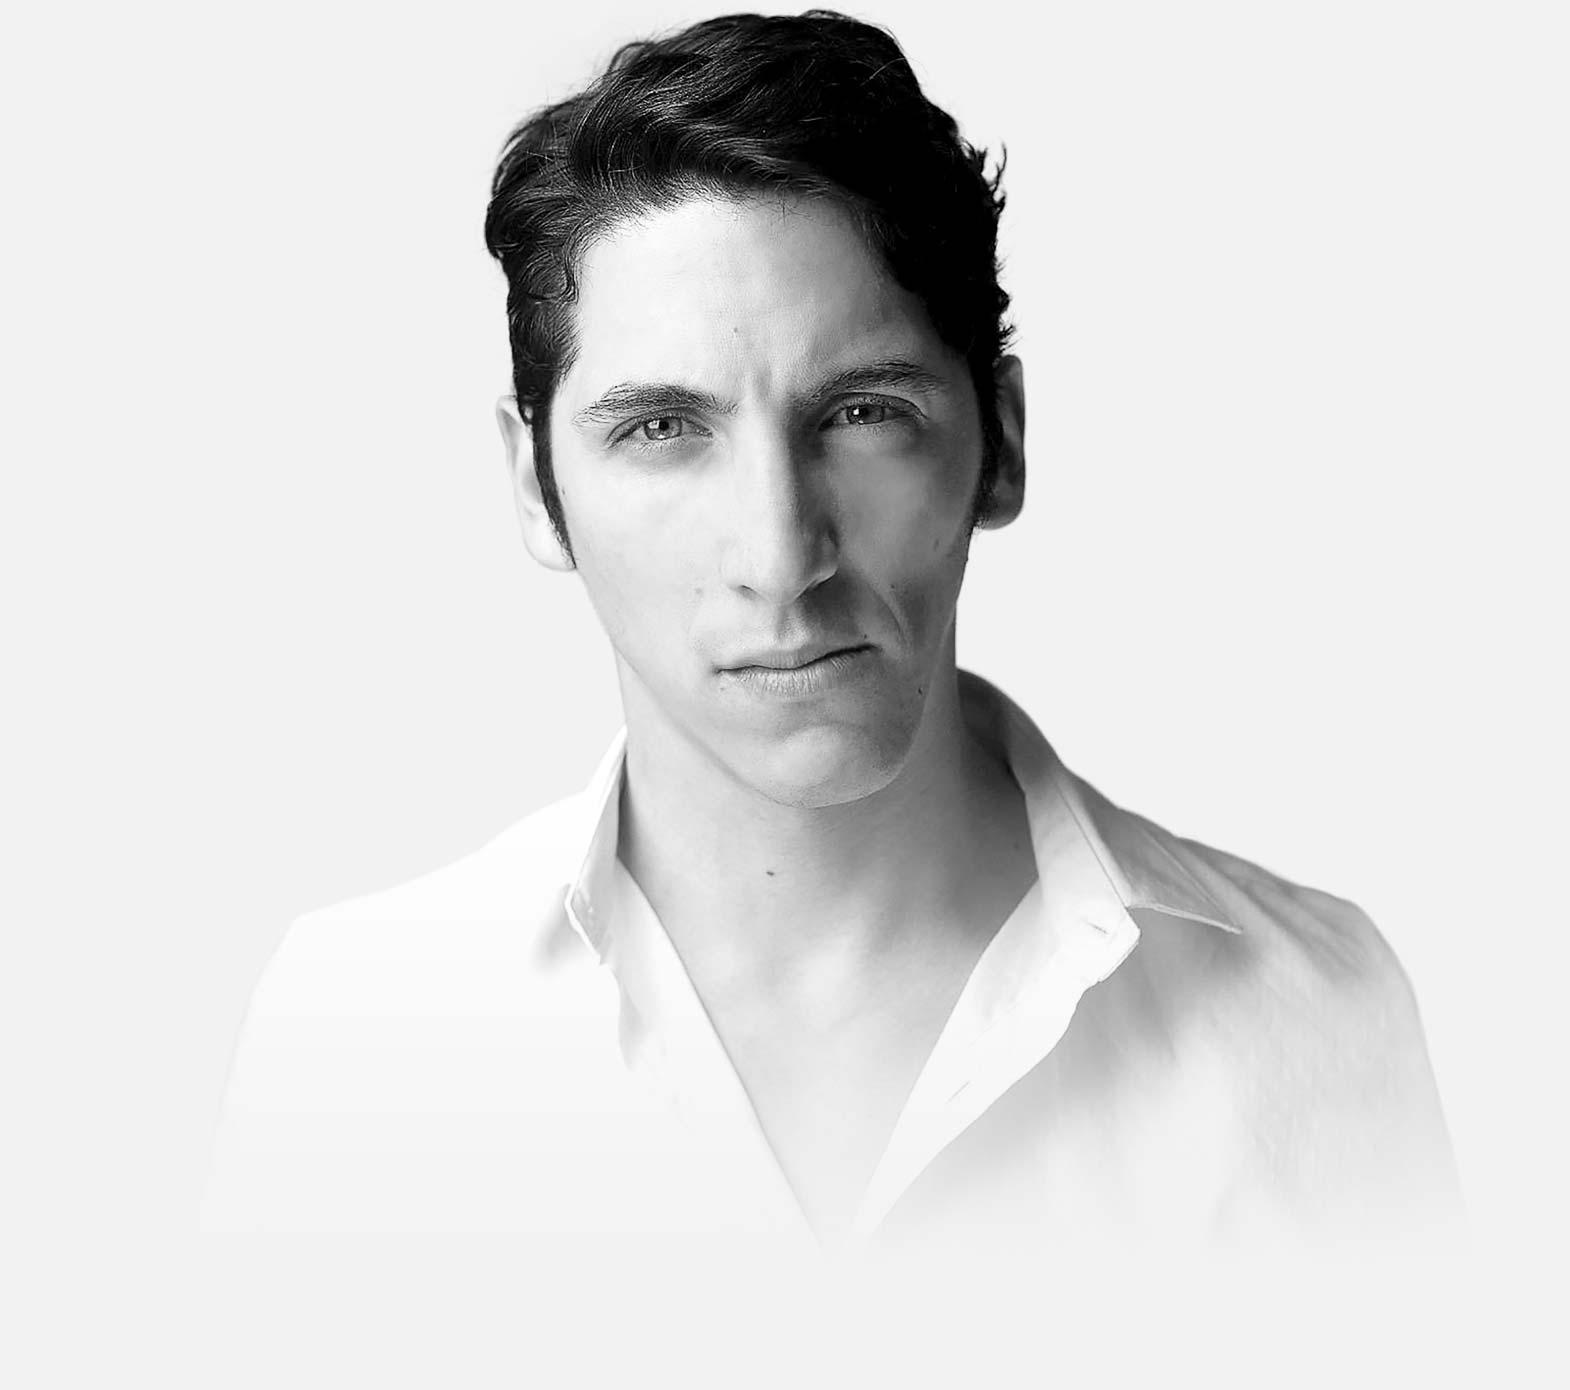 Portrait of Giorgio Schiro